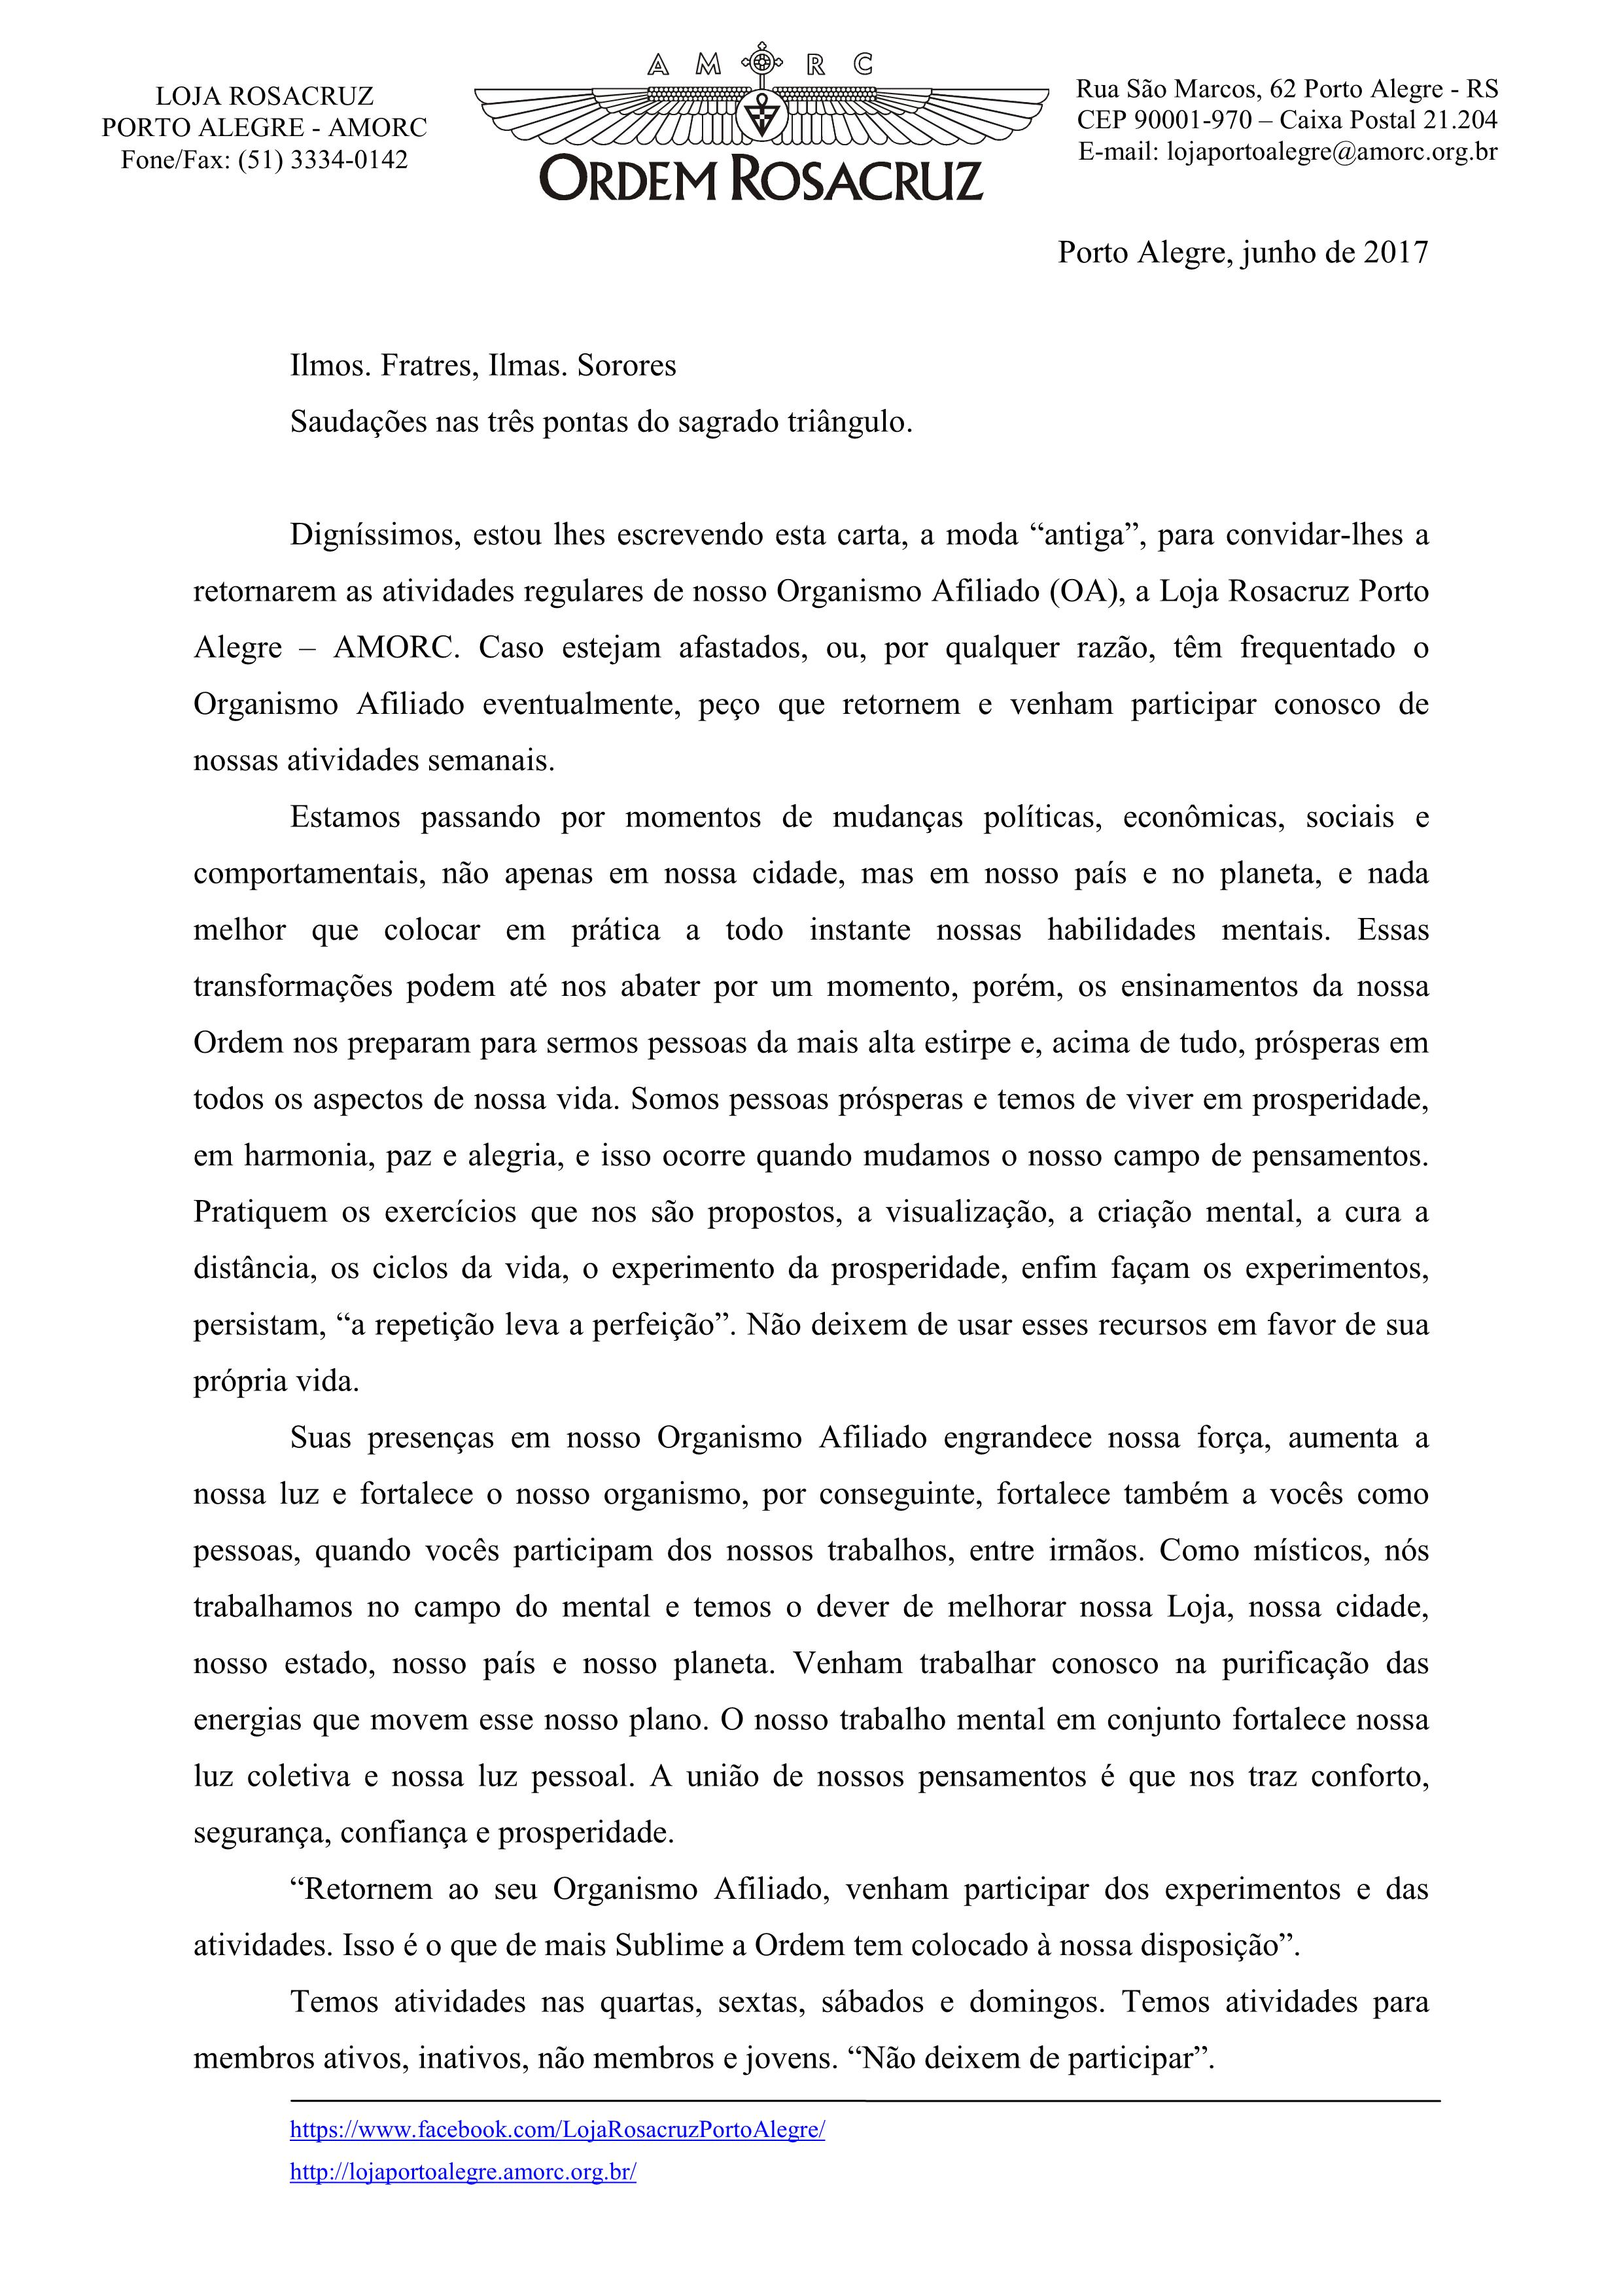 cartaDoMestrePagina1